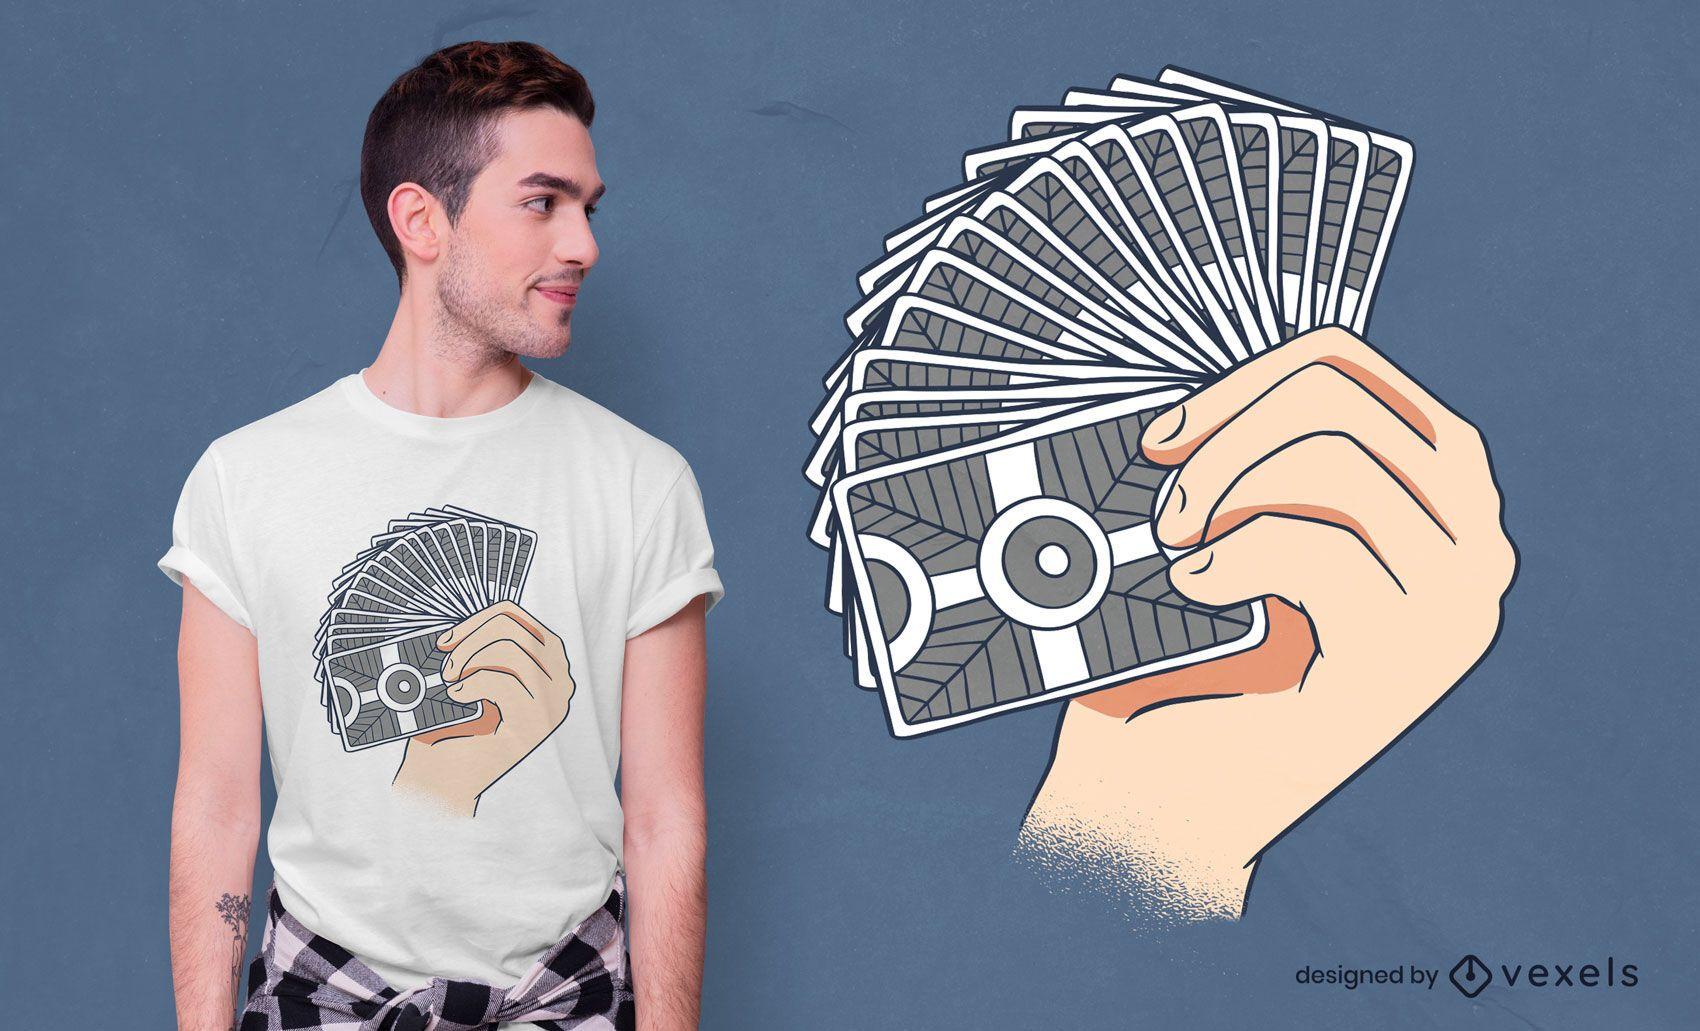 Card flourish t-shirt design